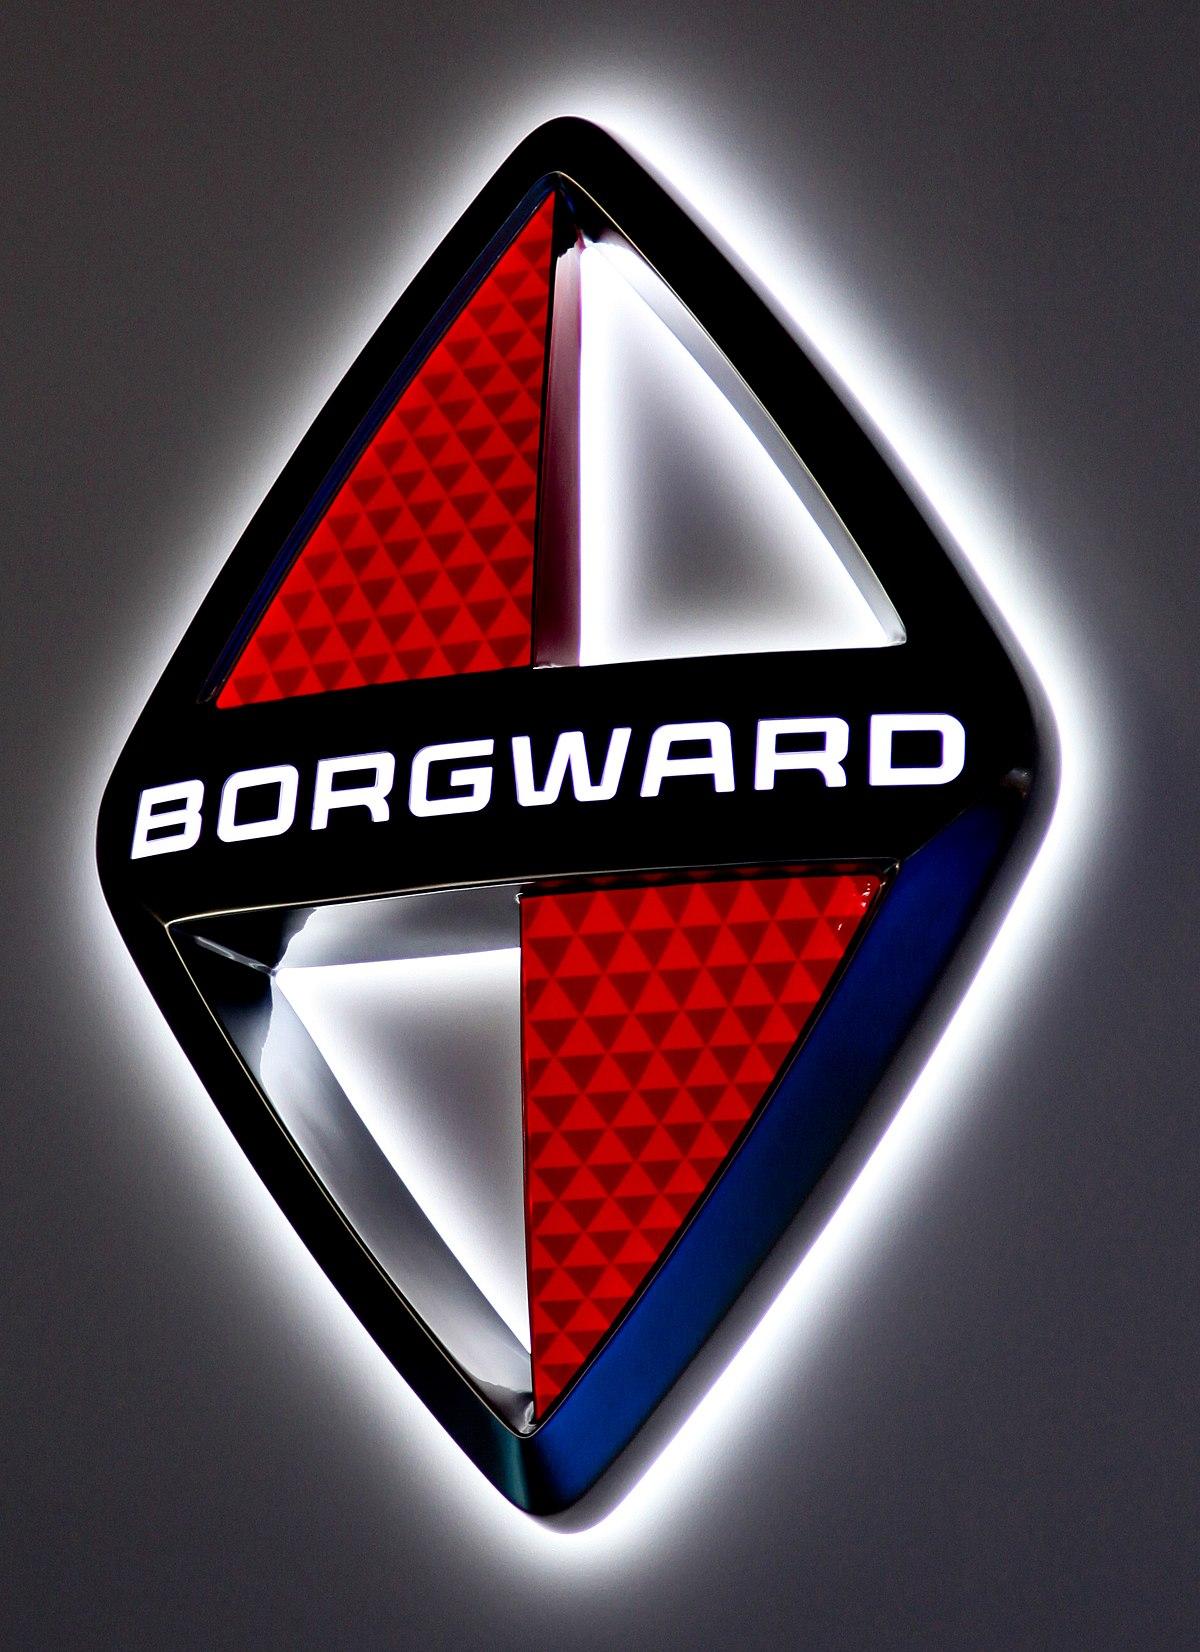 Borgward - Wikipedia